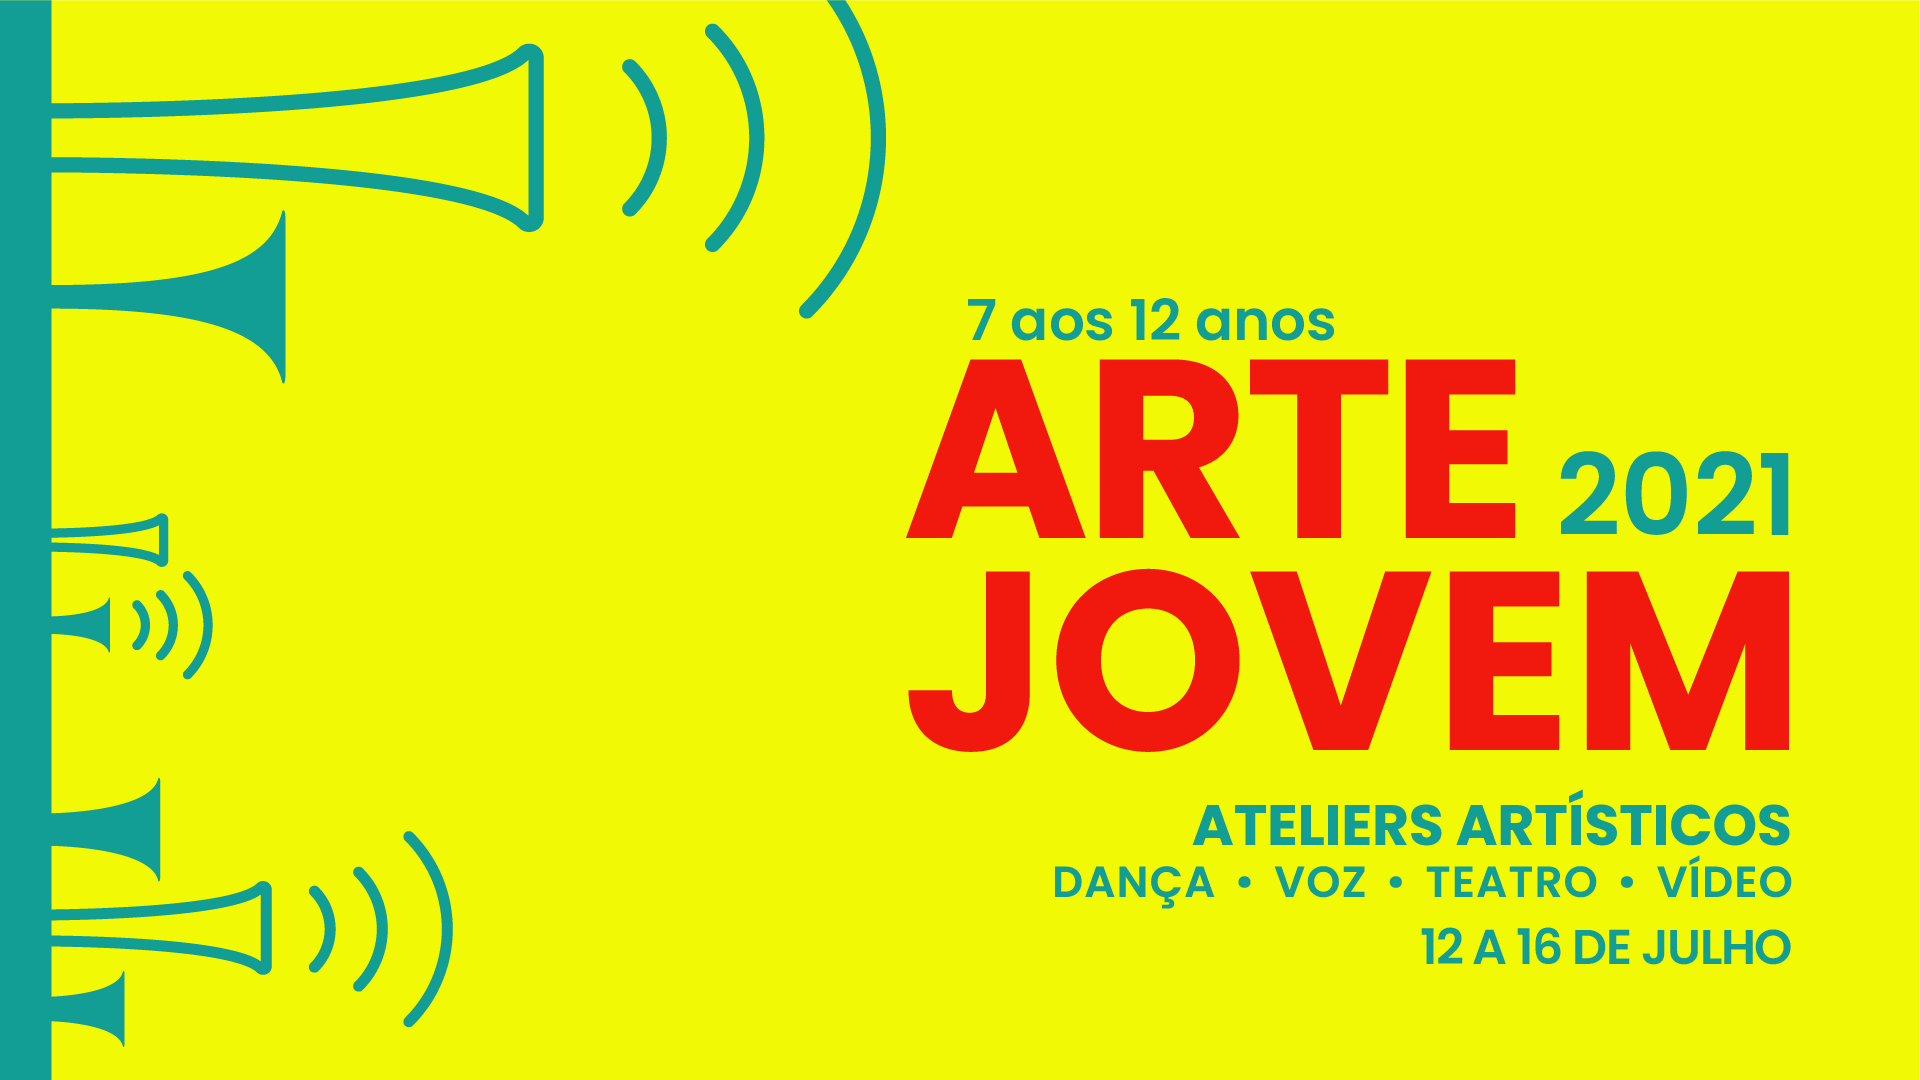 ARTE JOVEM 2021